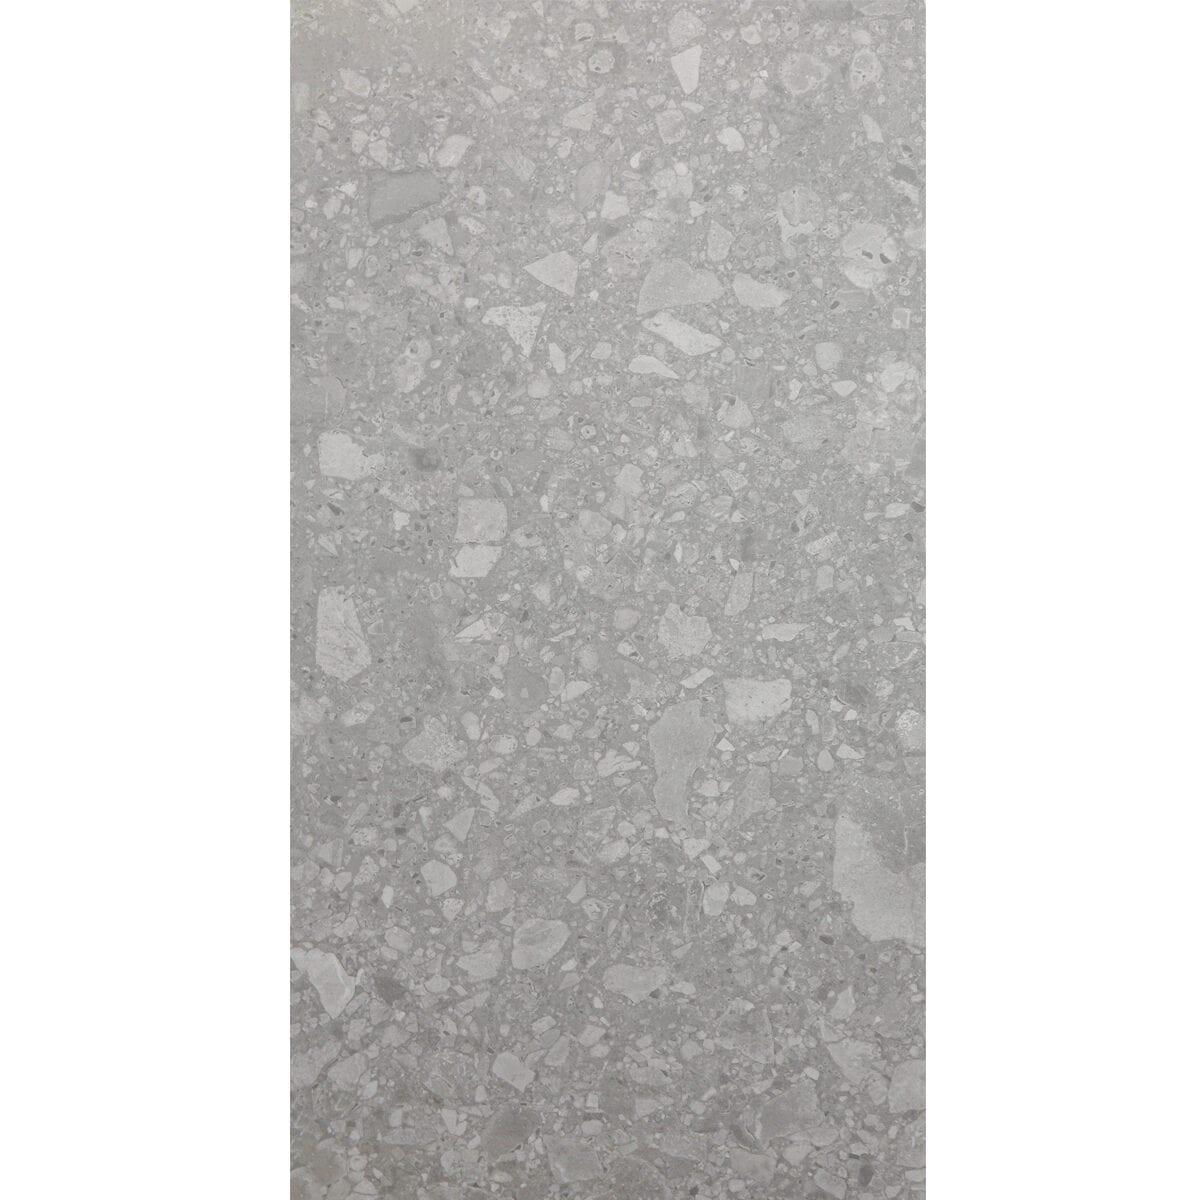 T10908 Starburst Alpaca White Polished 2